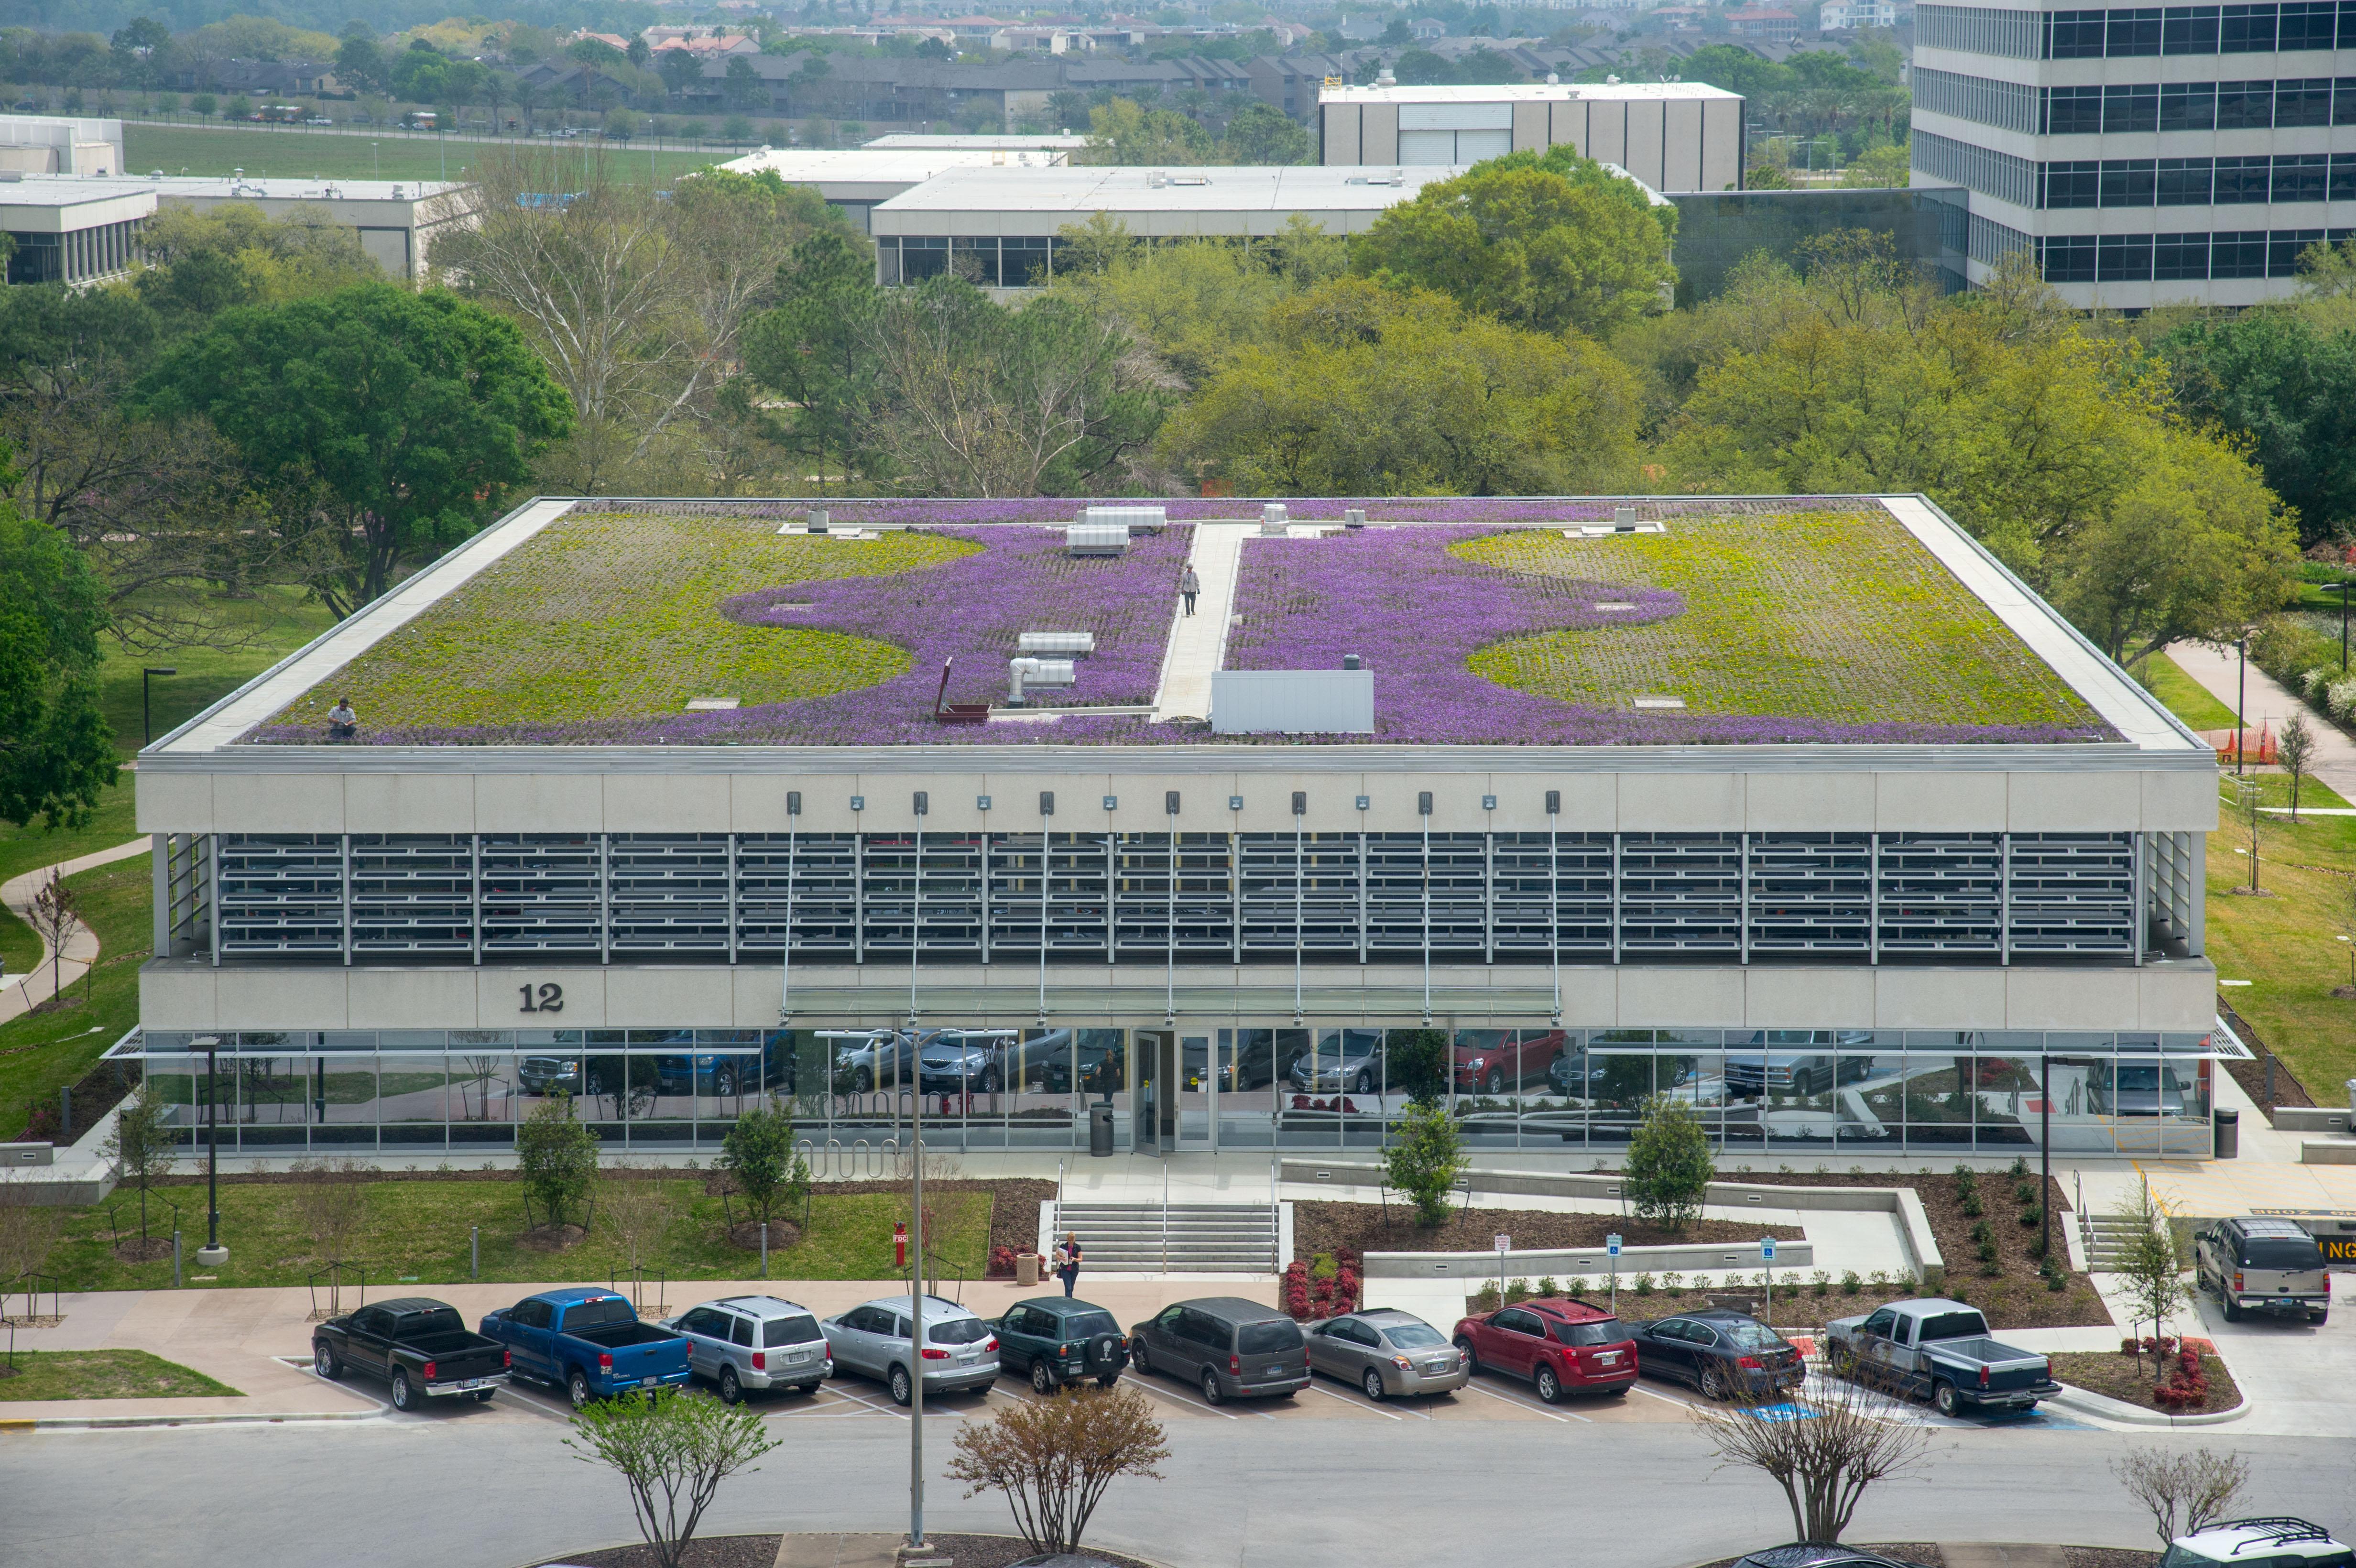 NASA - Center Management Checks Out a Not-So-Secret Garden ...